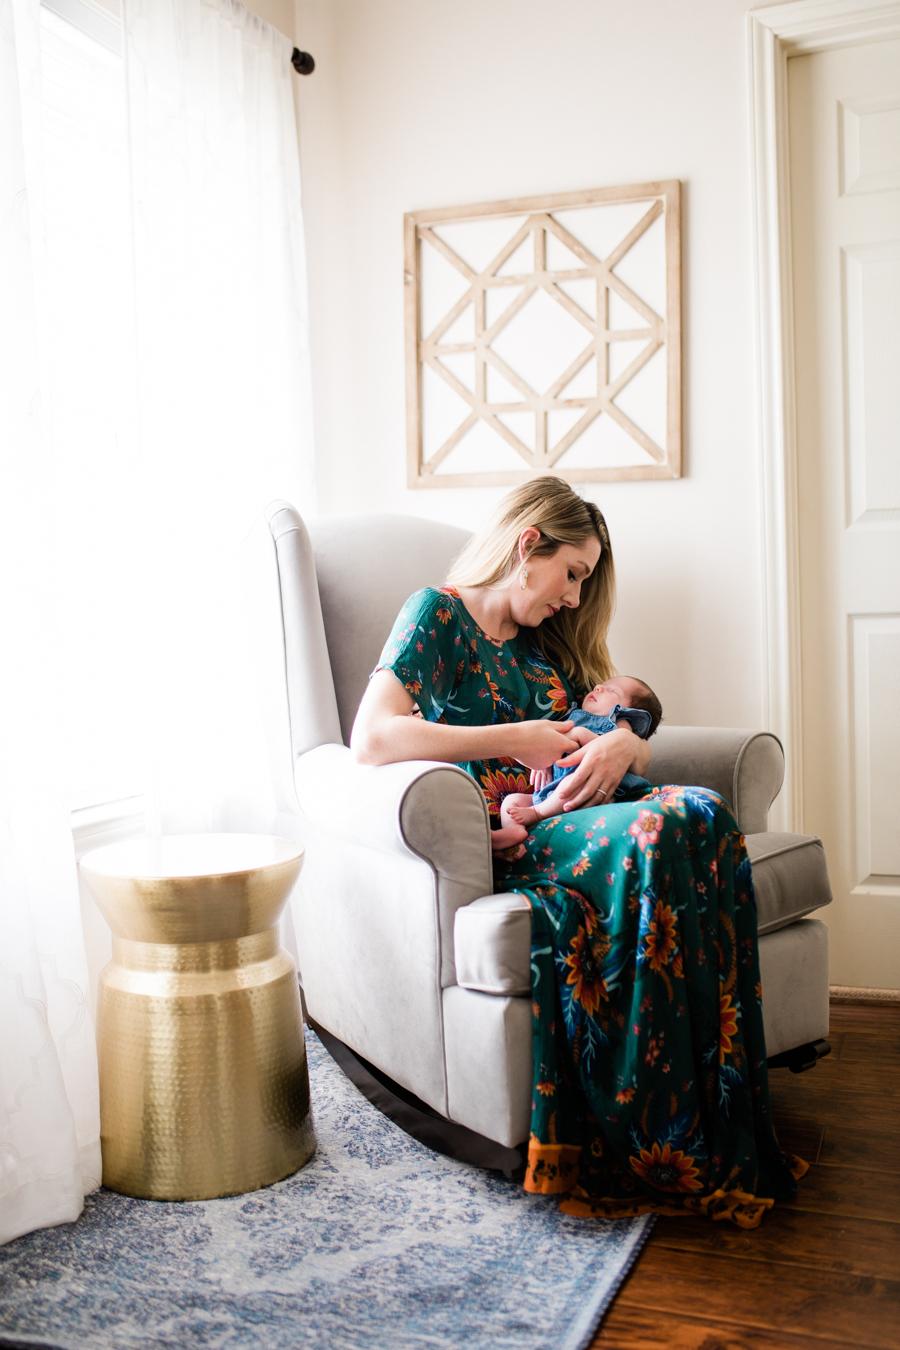 newborn_photographer_houston_texas02.jpg